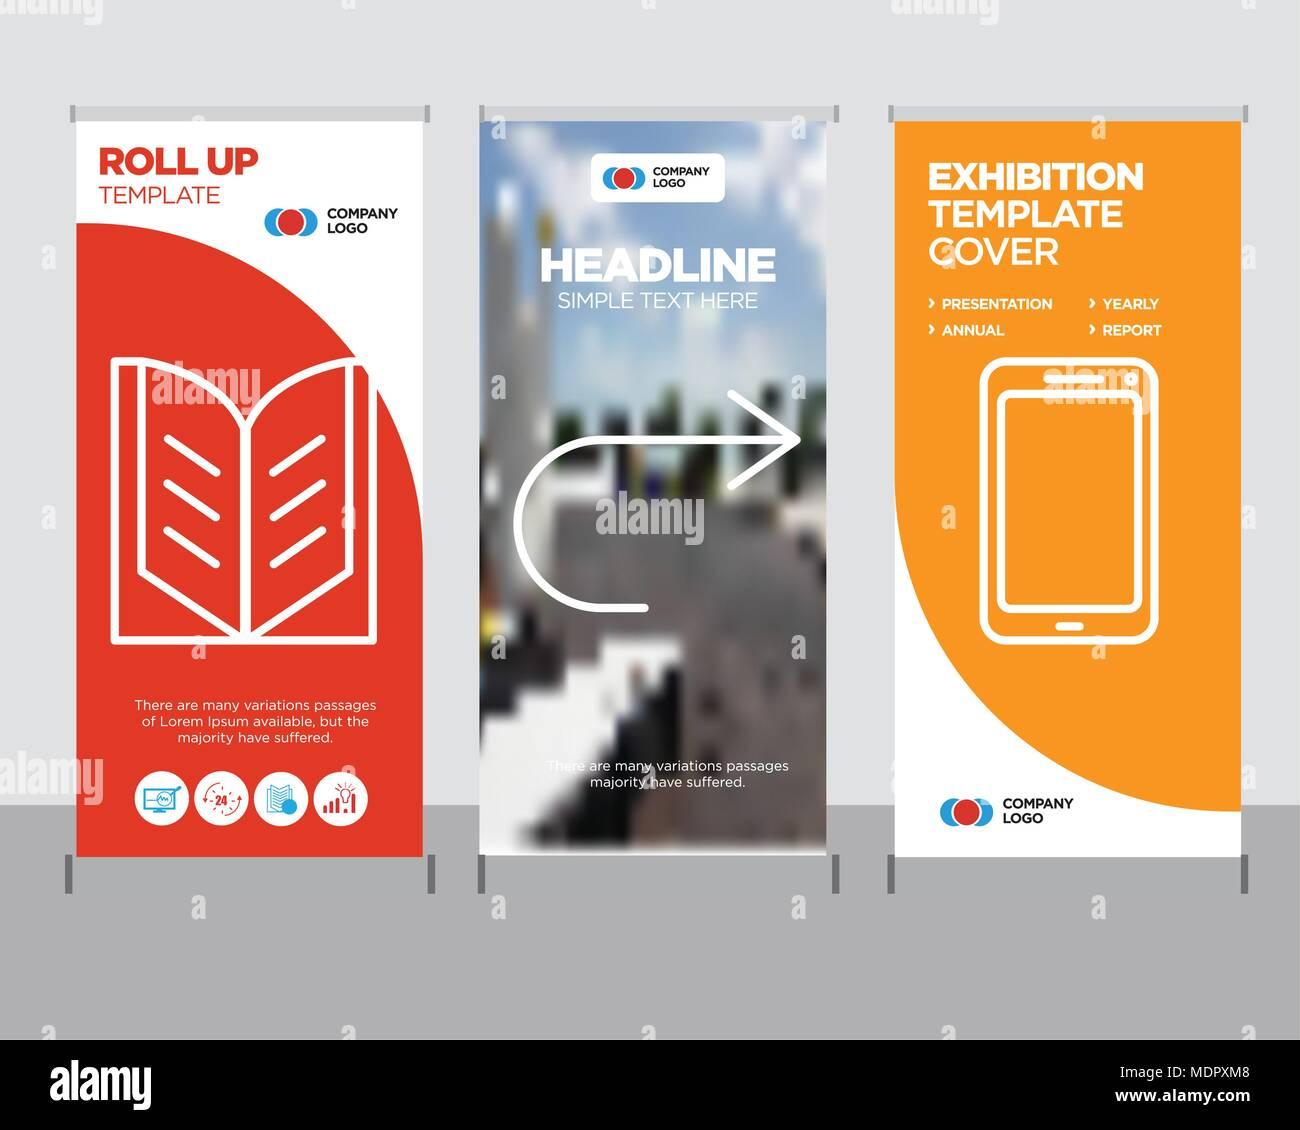 Creative Book Cover Design Samples ~ Smartphone modern business roll up banner design template arrow